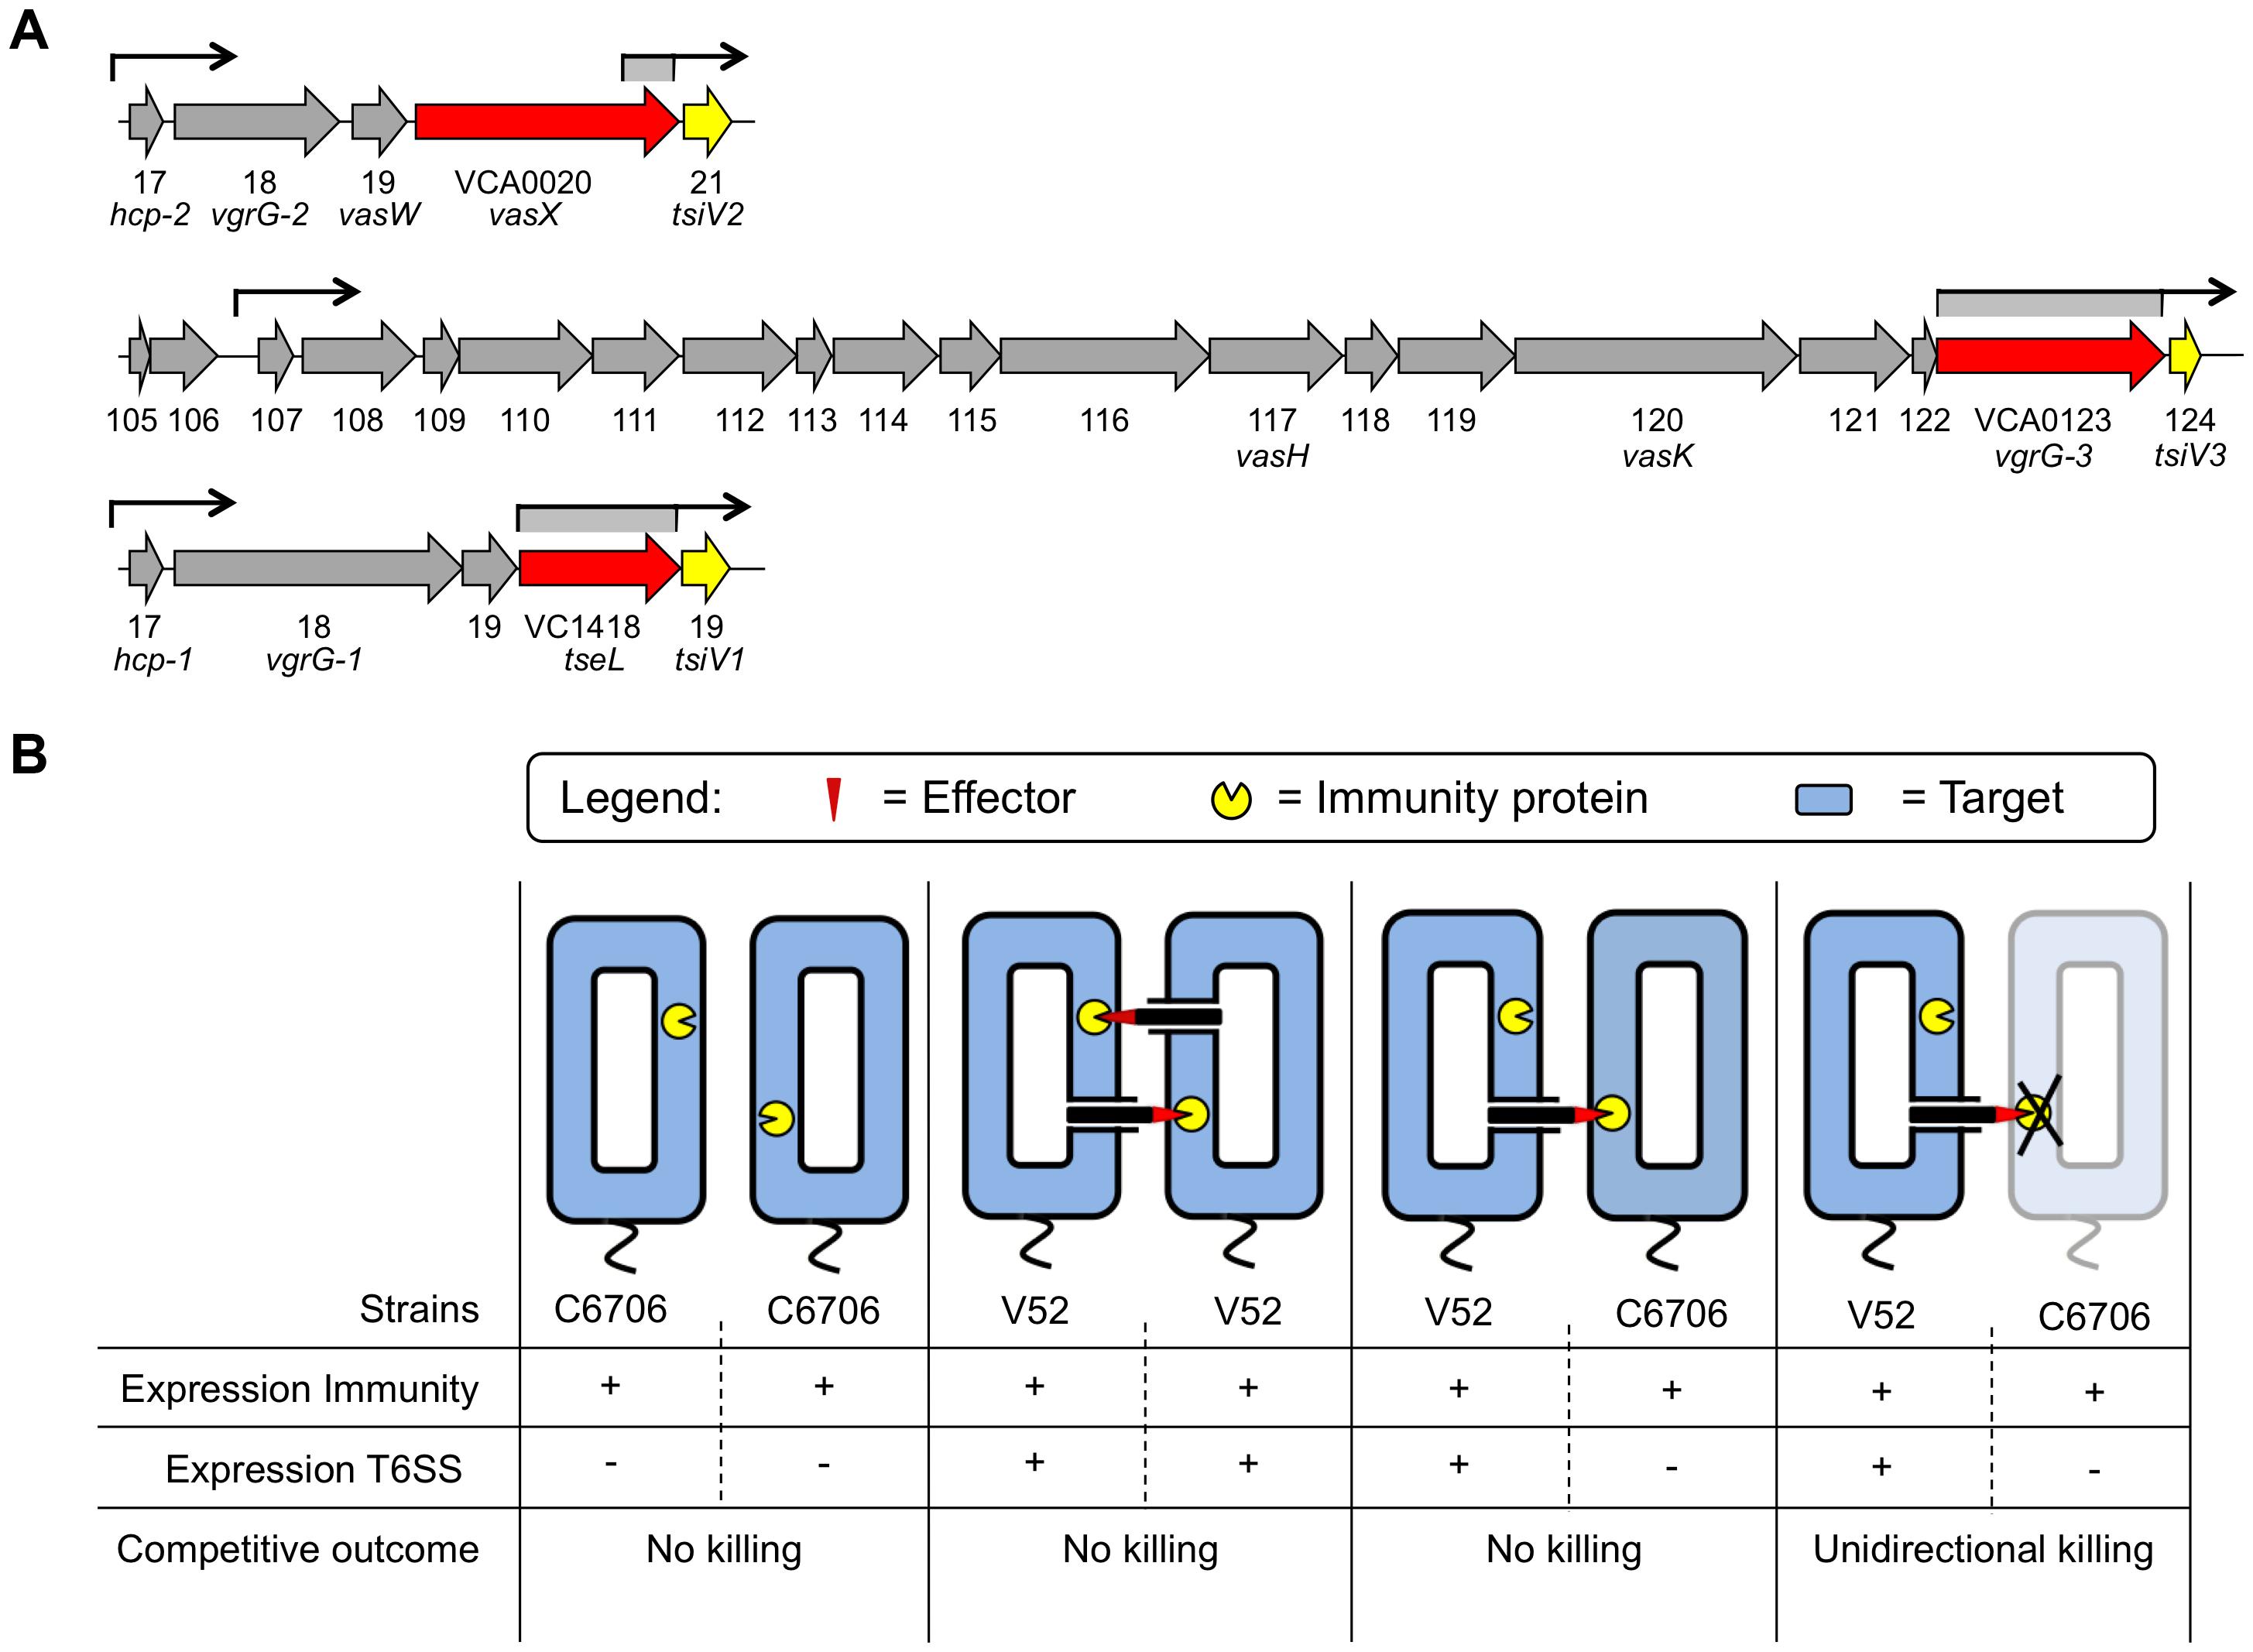 Dual regulatory profile of T6SS immunity protein-encoding genes.